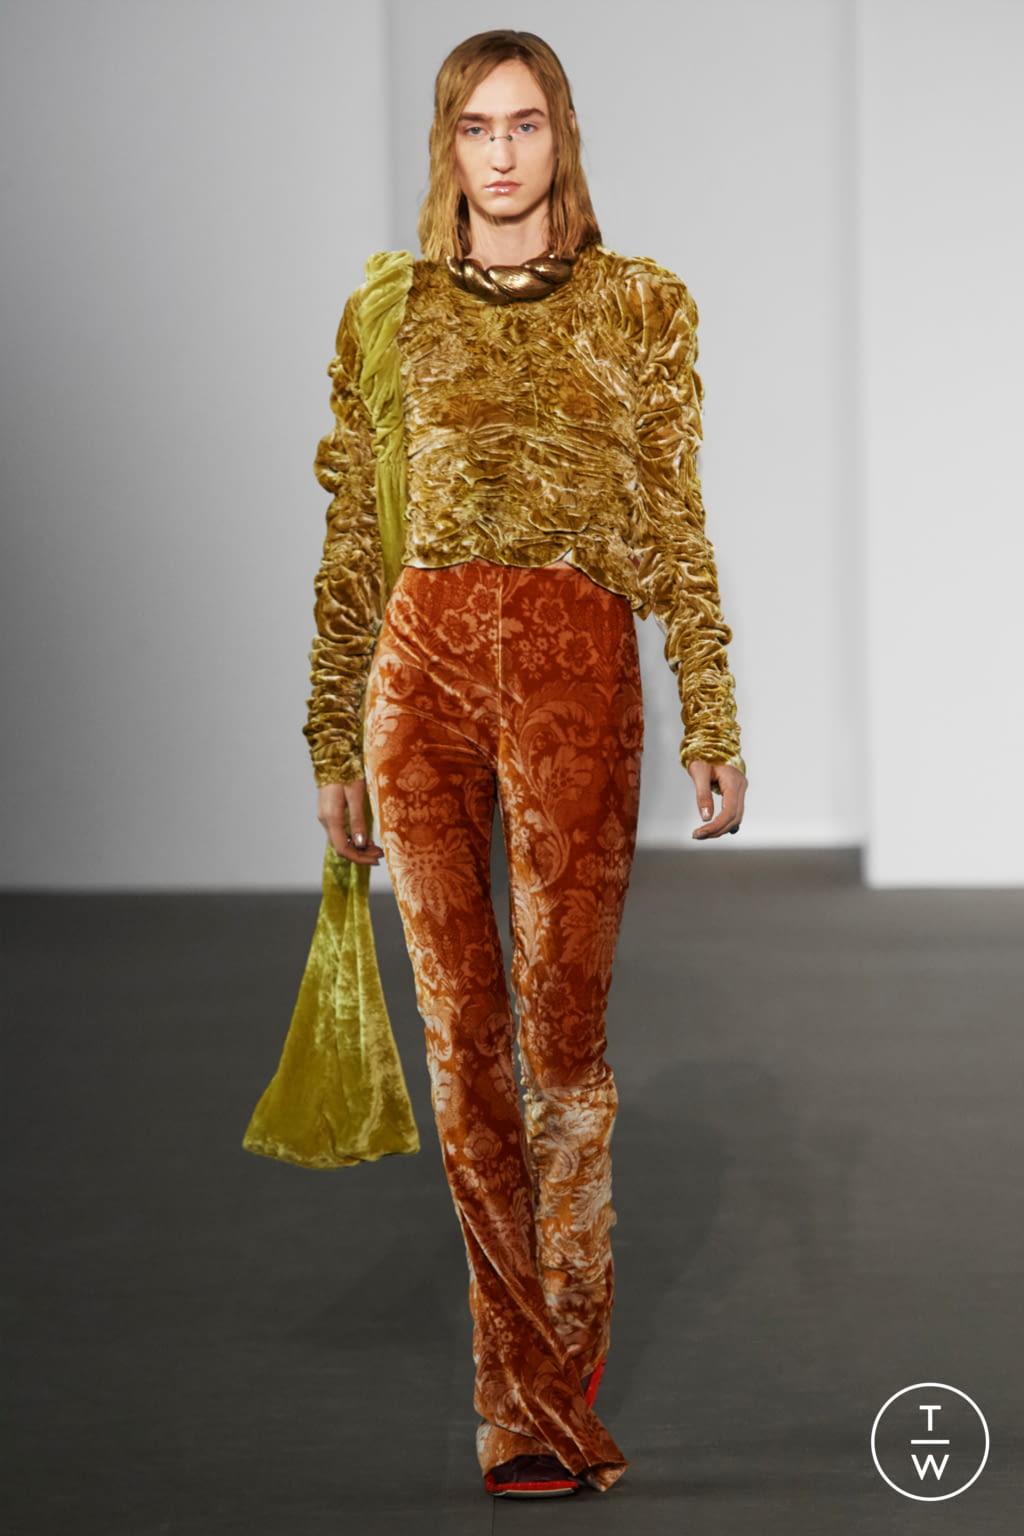 Fashion Week Paris Fall/Winter 2020 look 13 de la collection Acne Studios womenswear